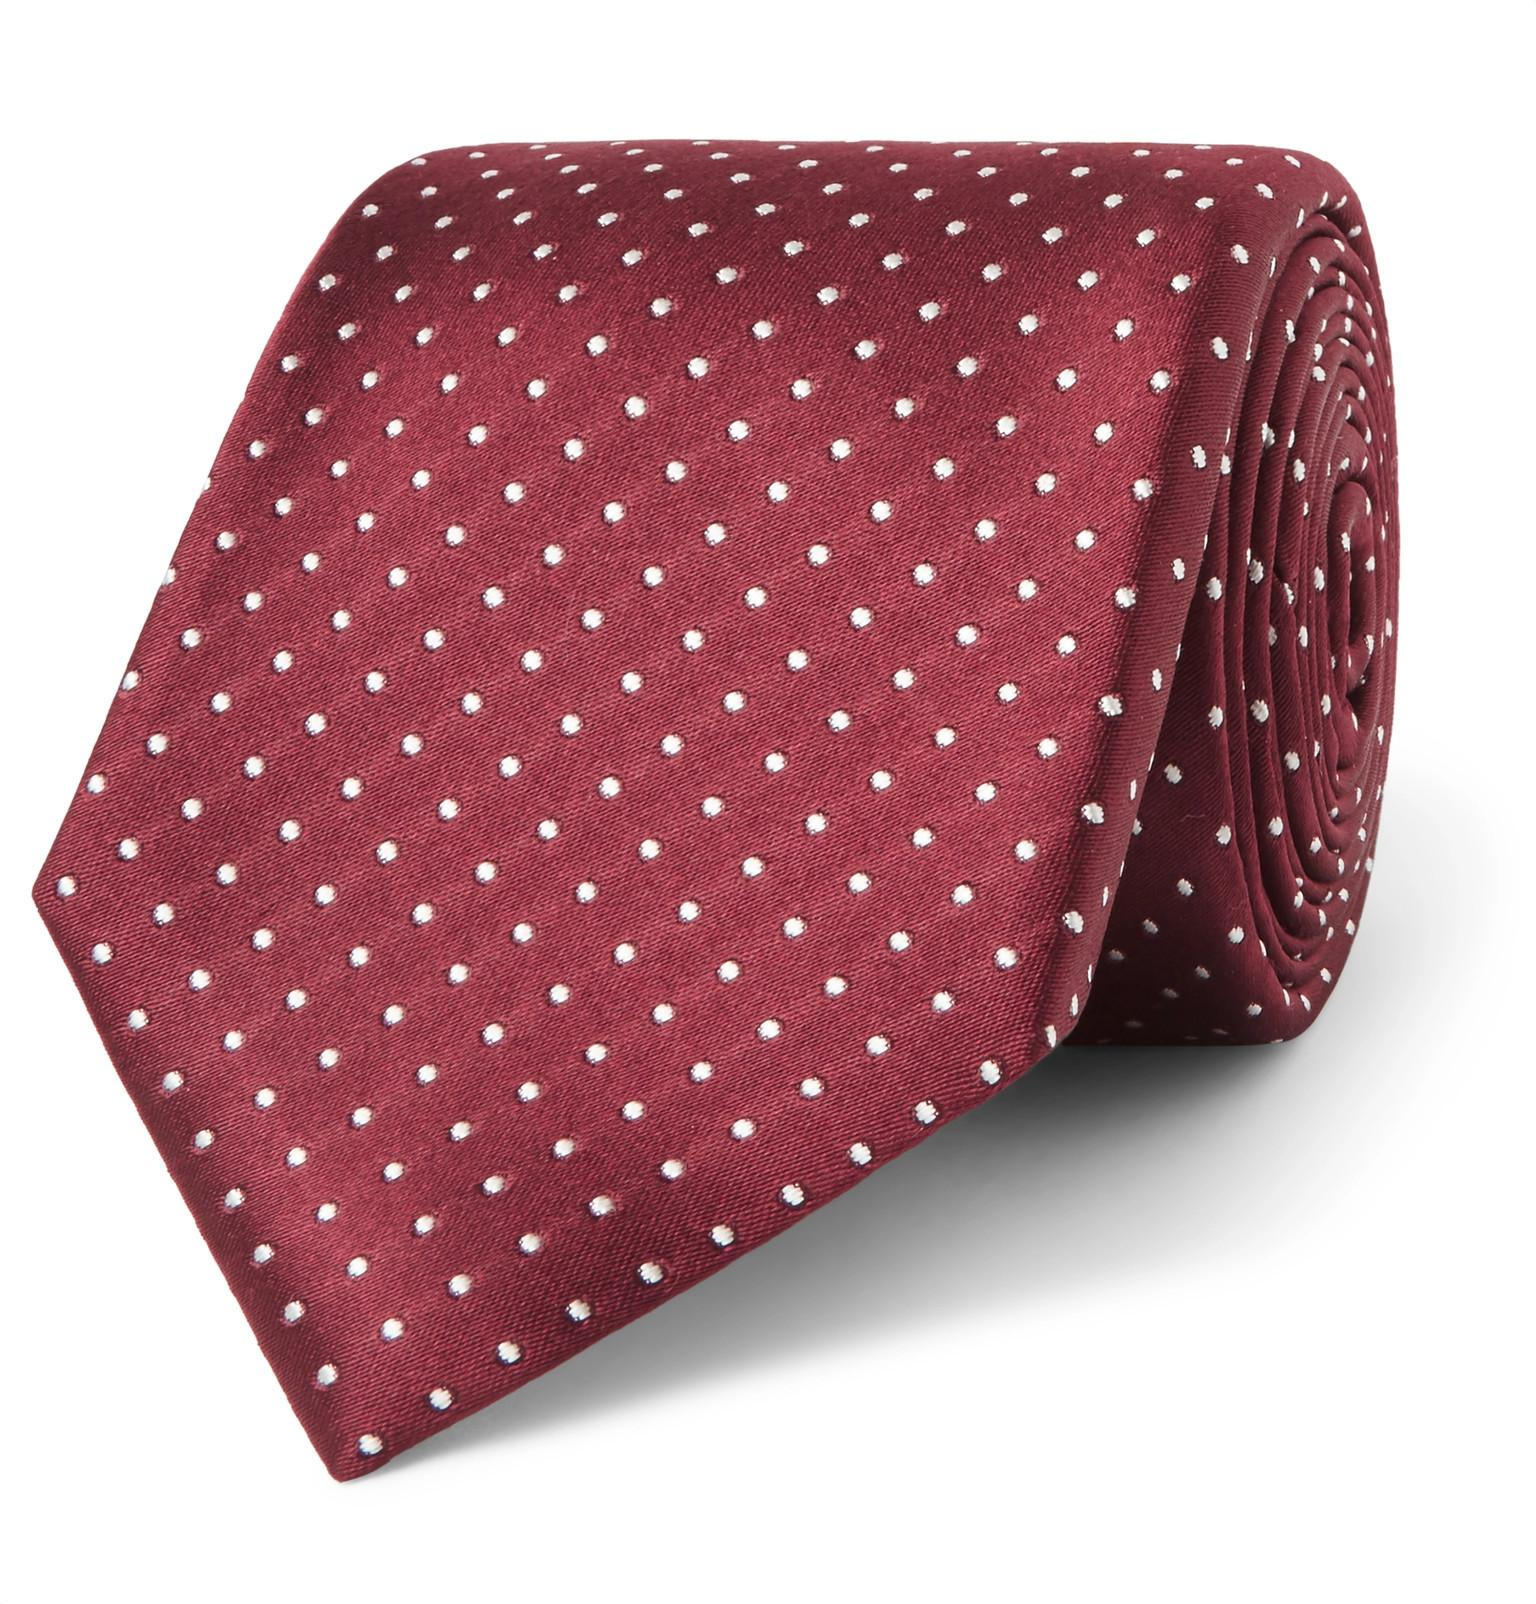 Cravate Tom Ford Soie Jacquard 8cm À Pois ElPKi